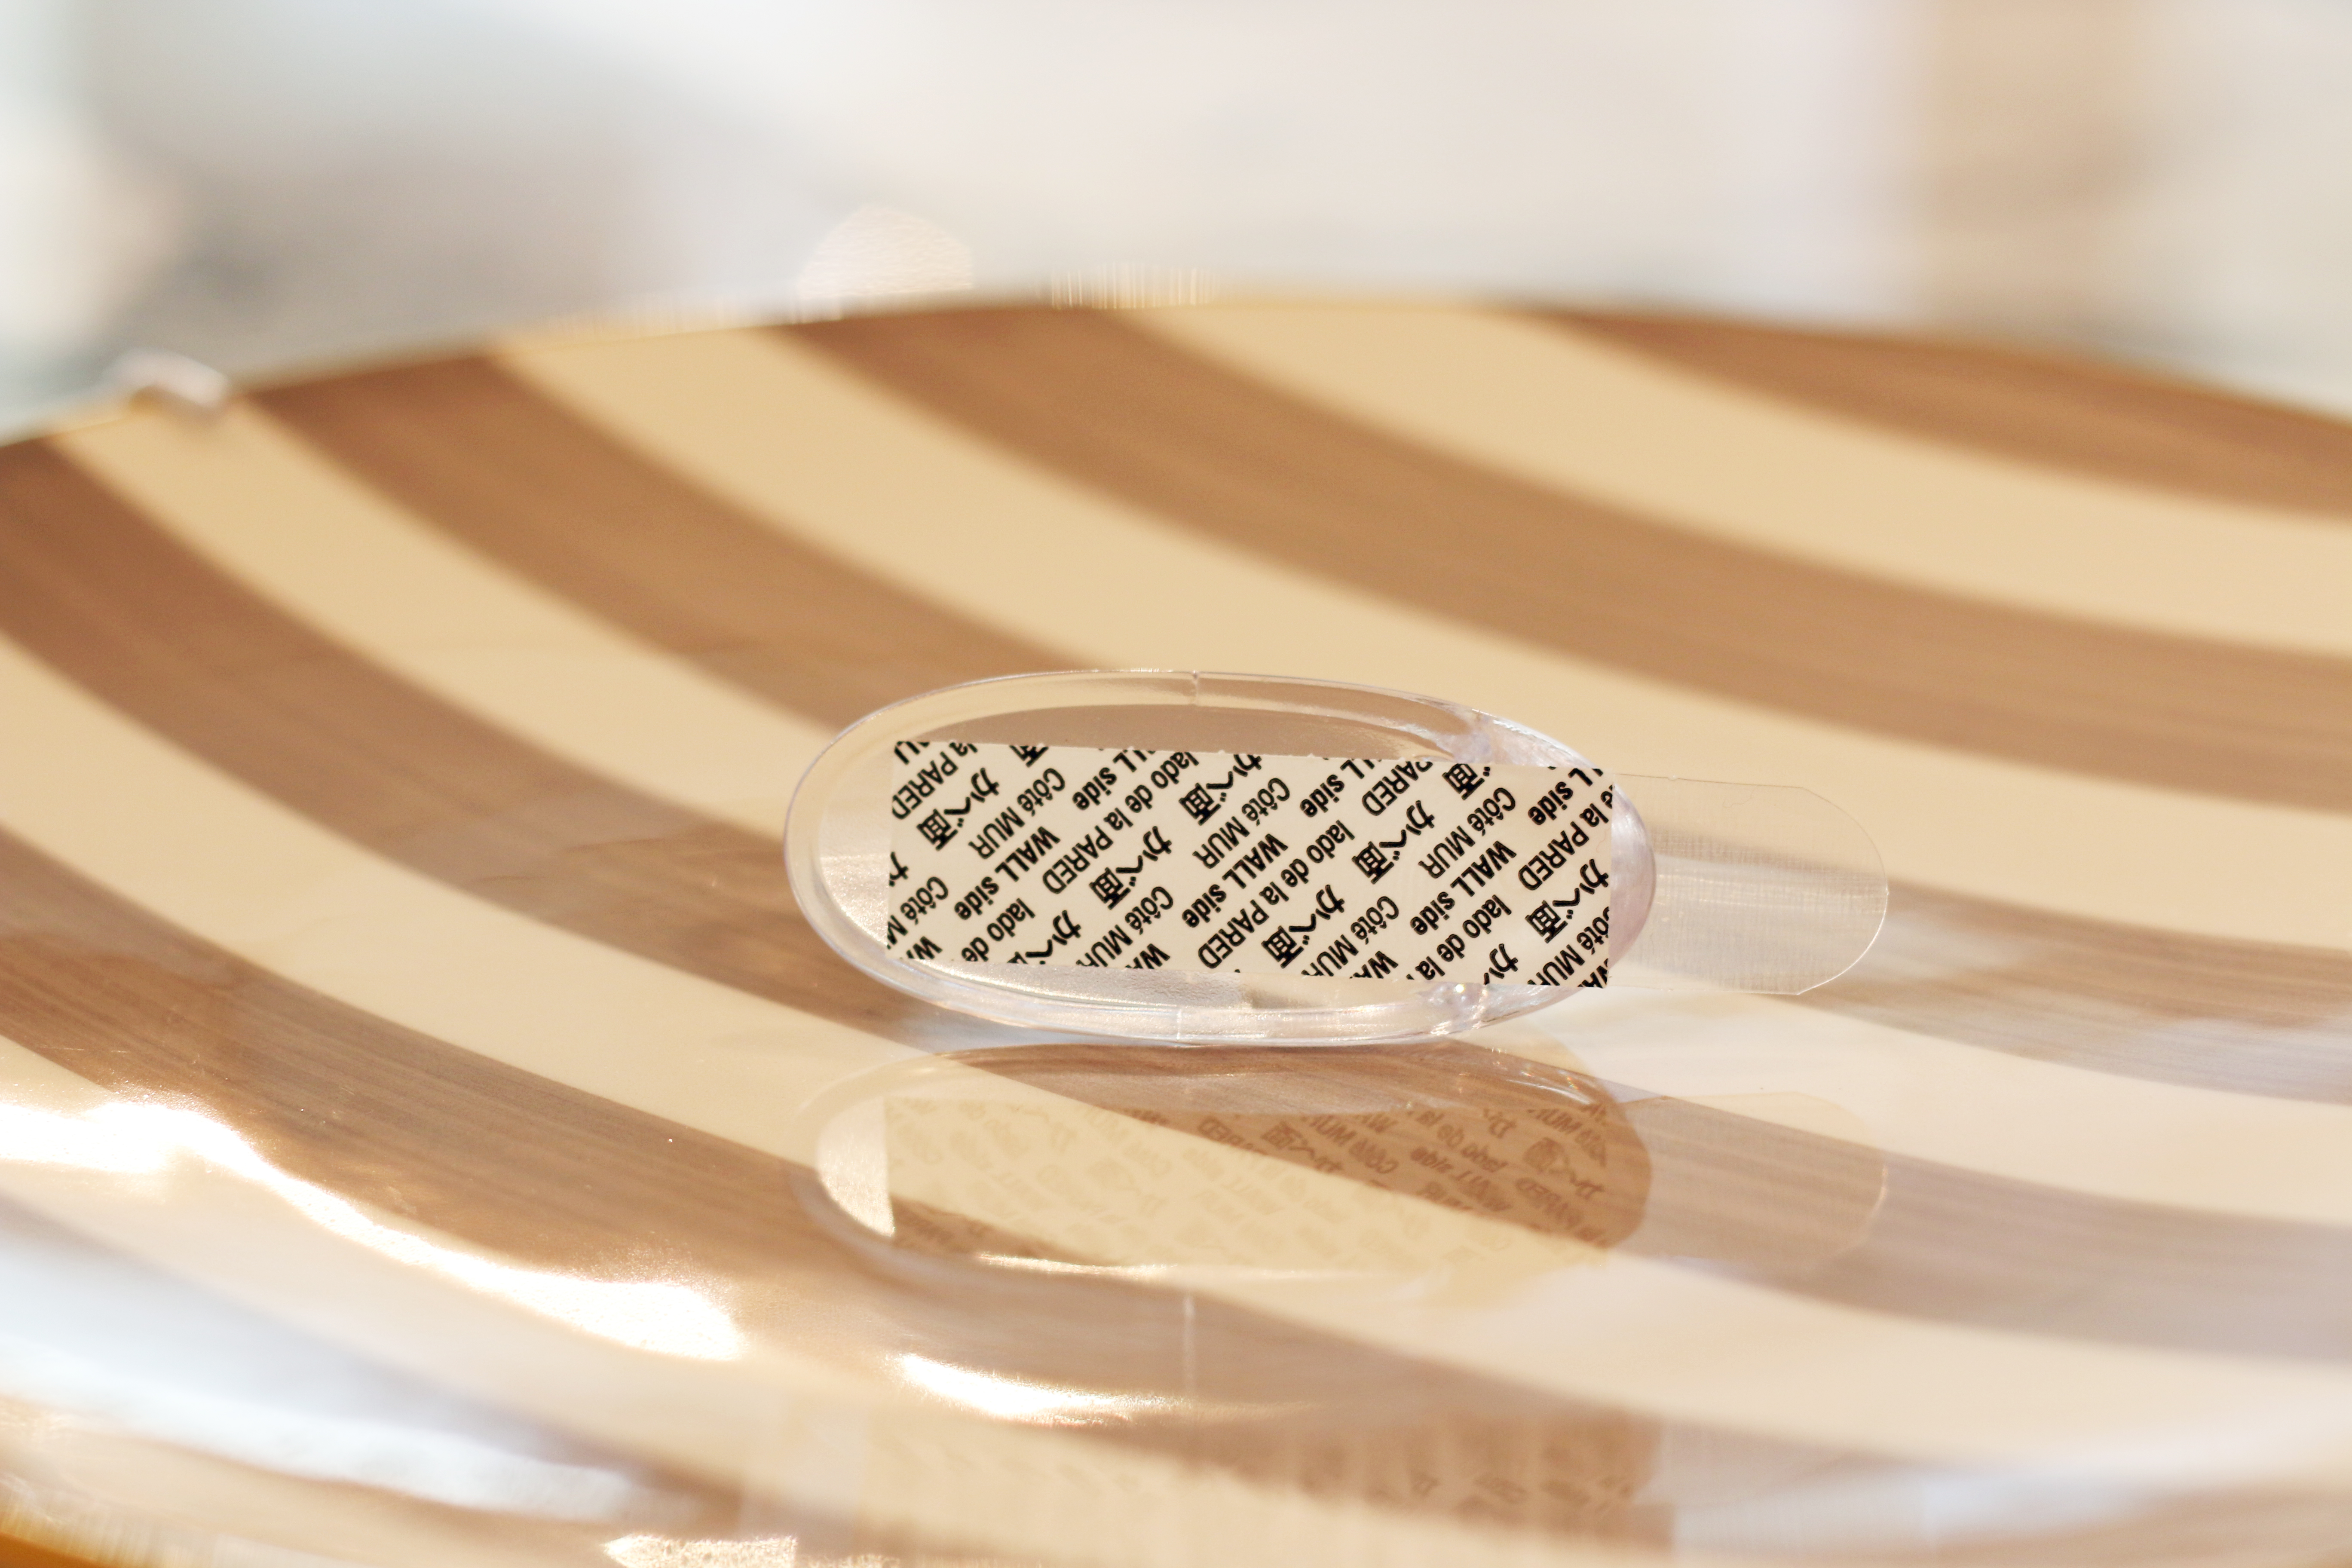 How to Hang Plates on Kitchen Backsplash 6